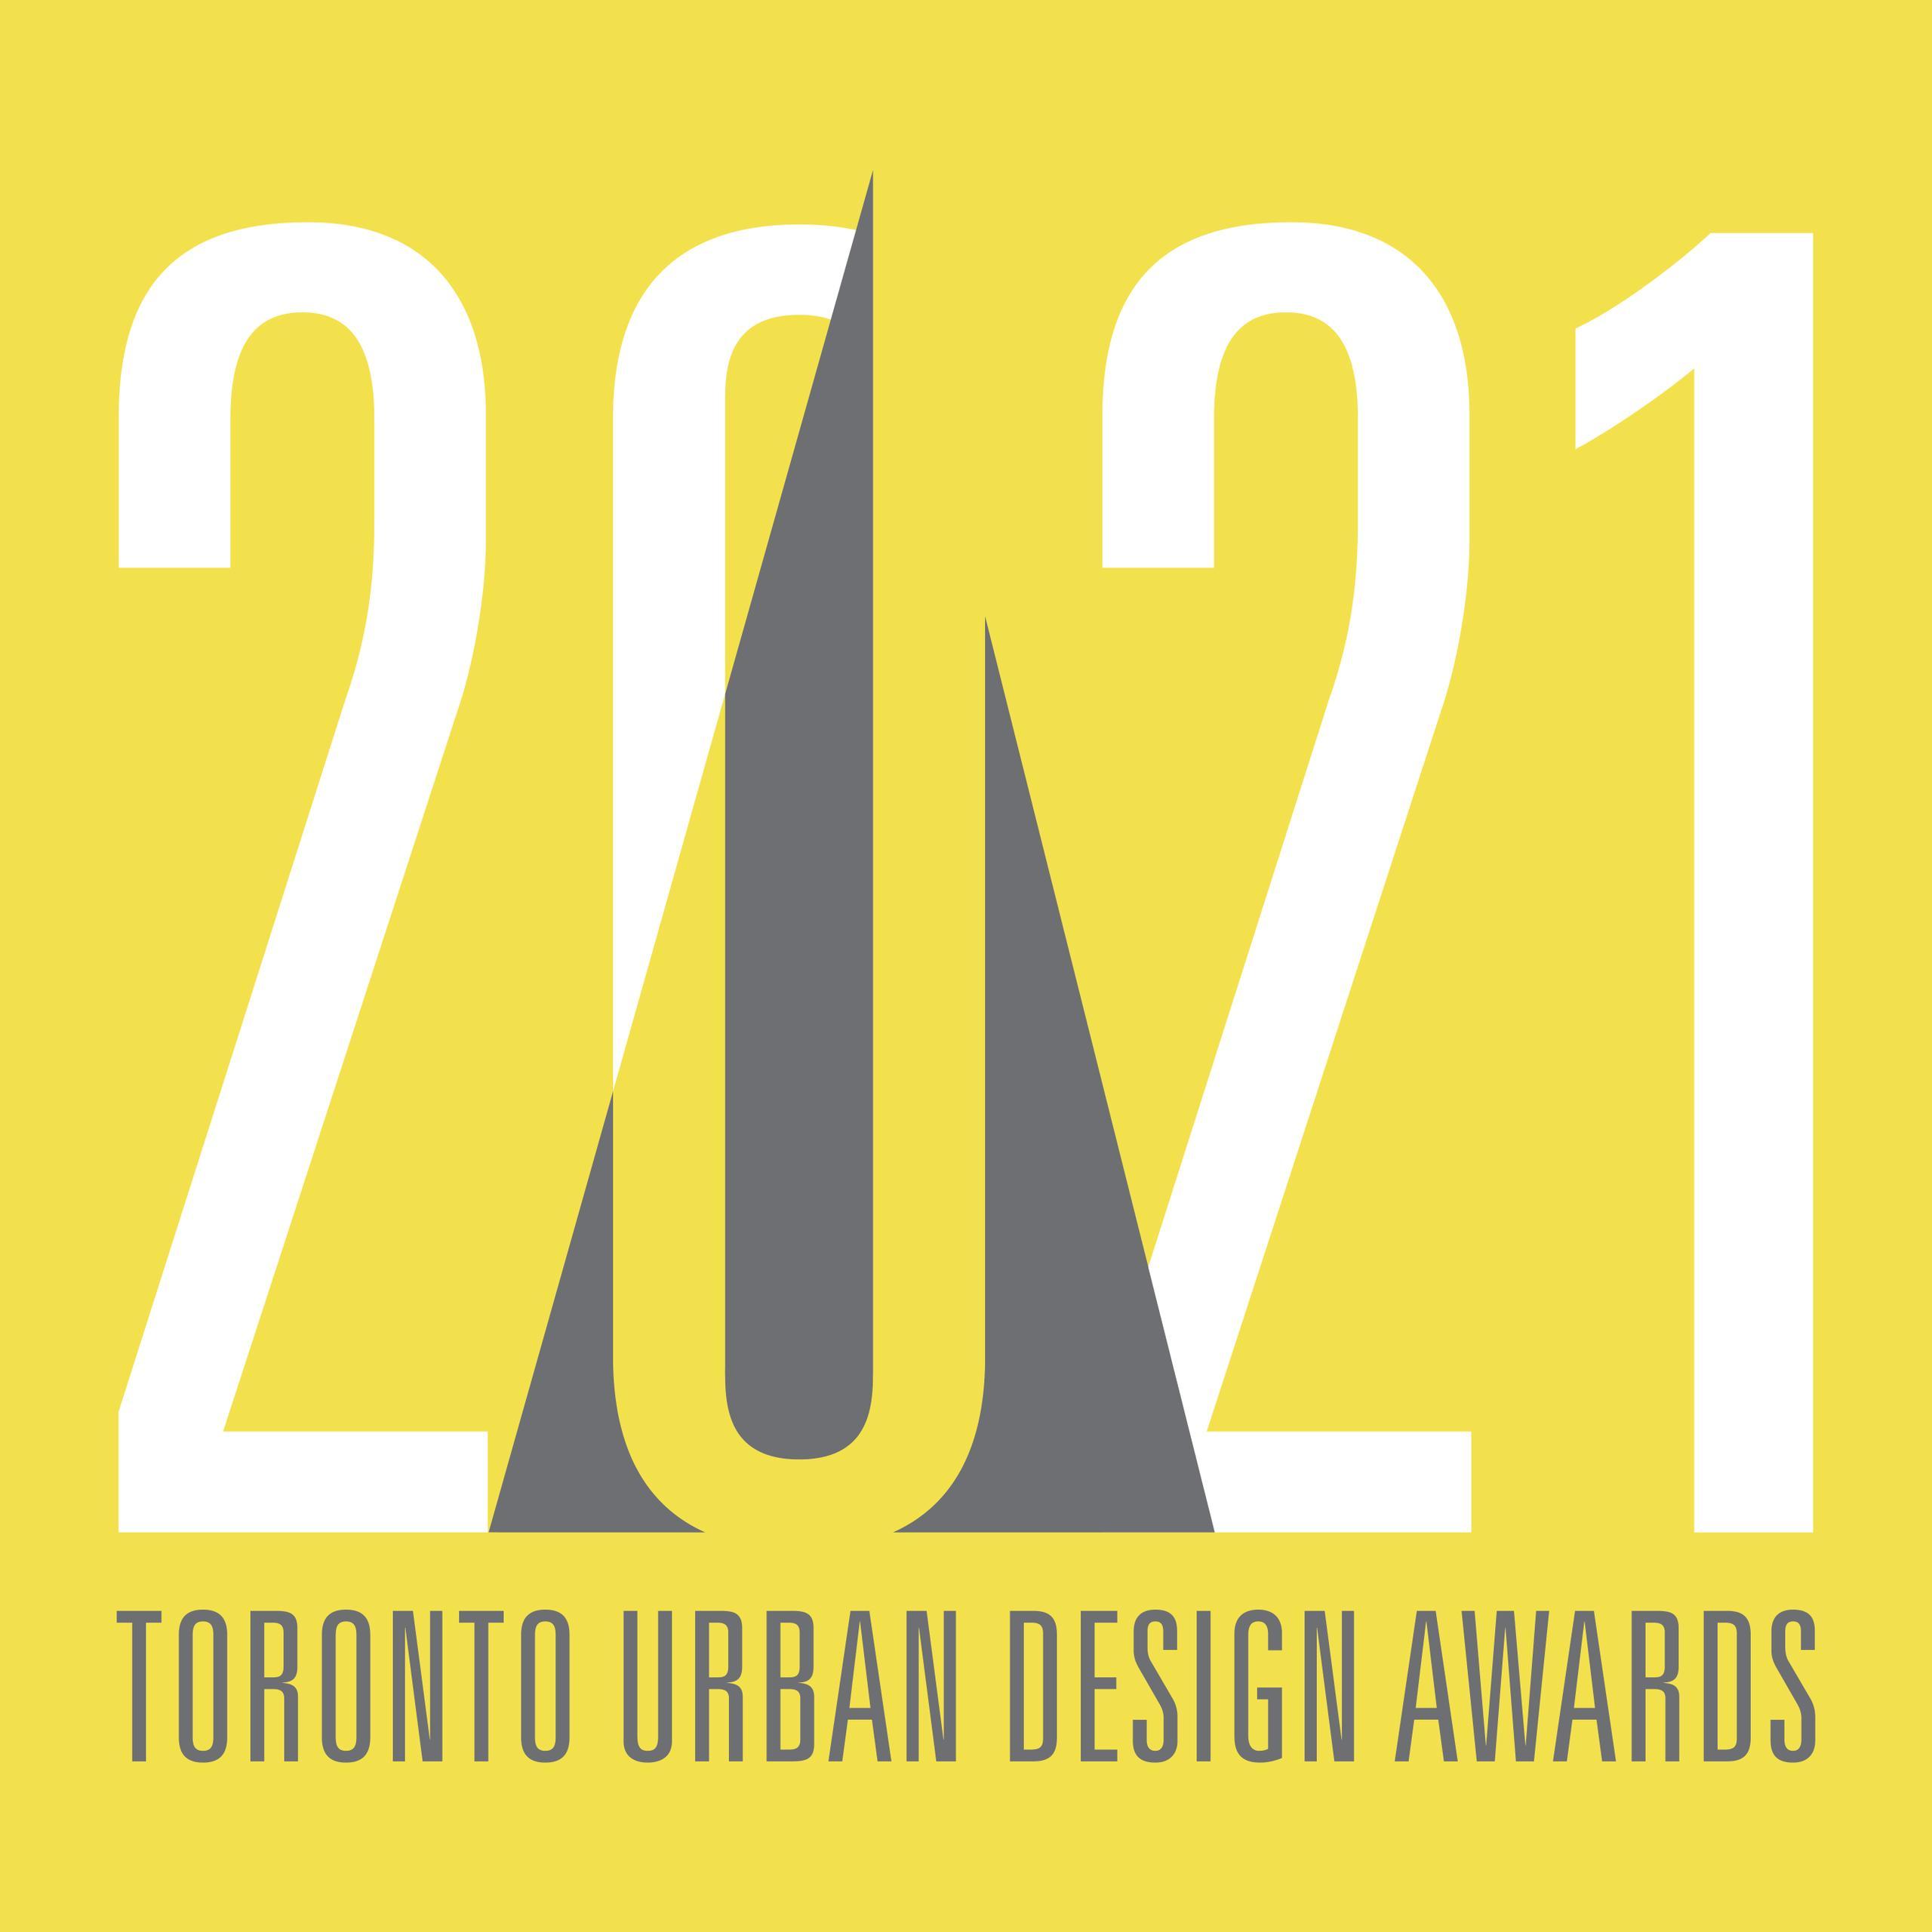 Toronto Urban Design Awards 2021 logo